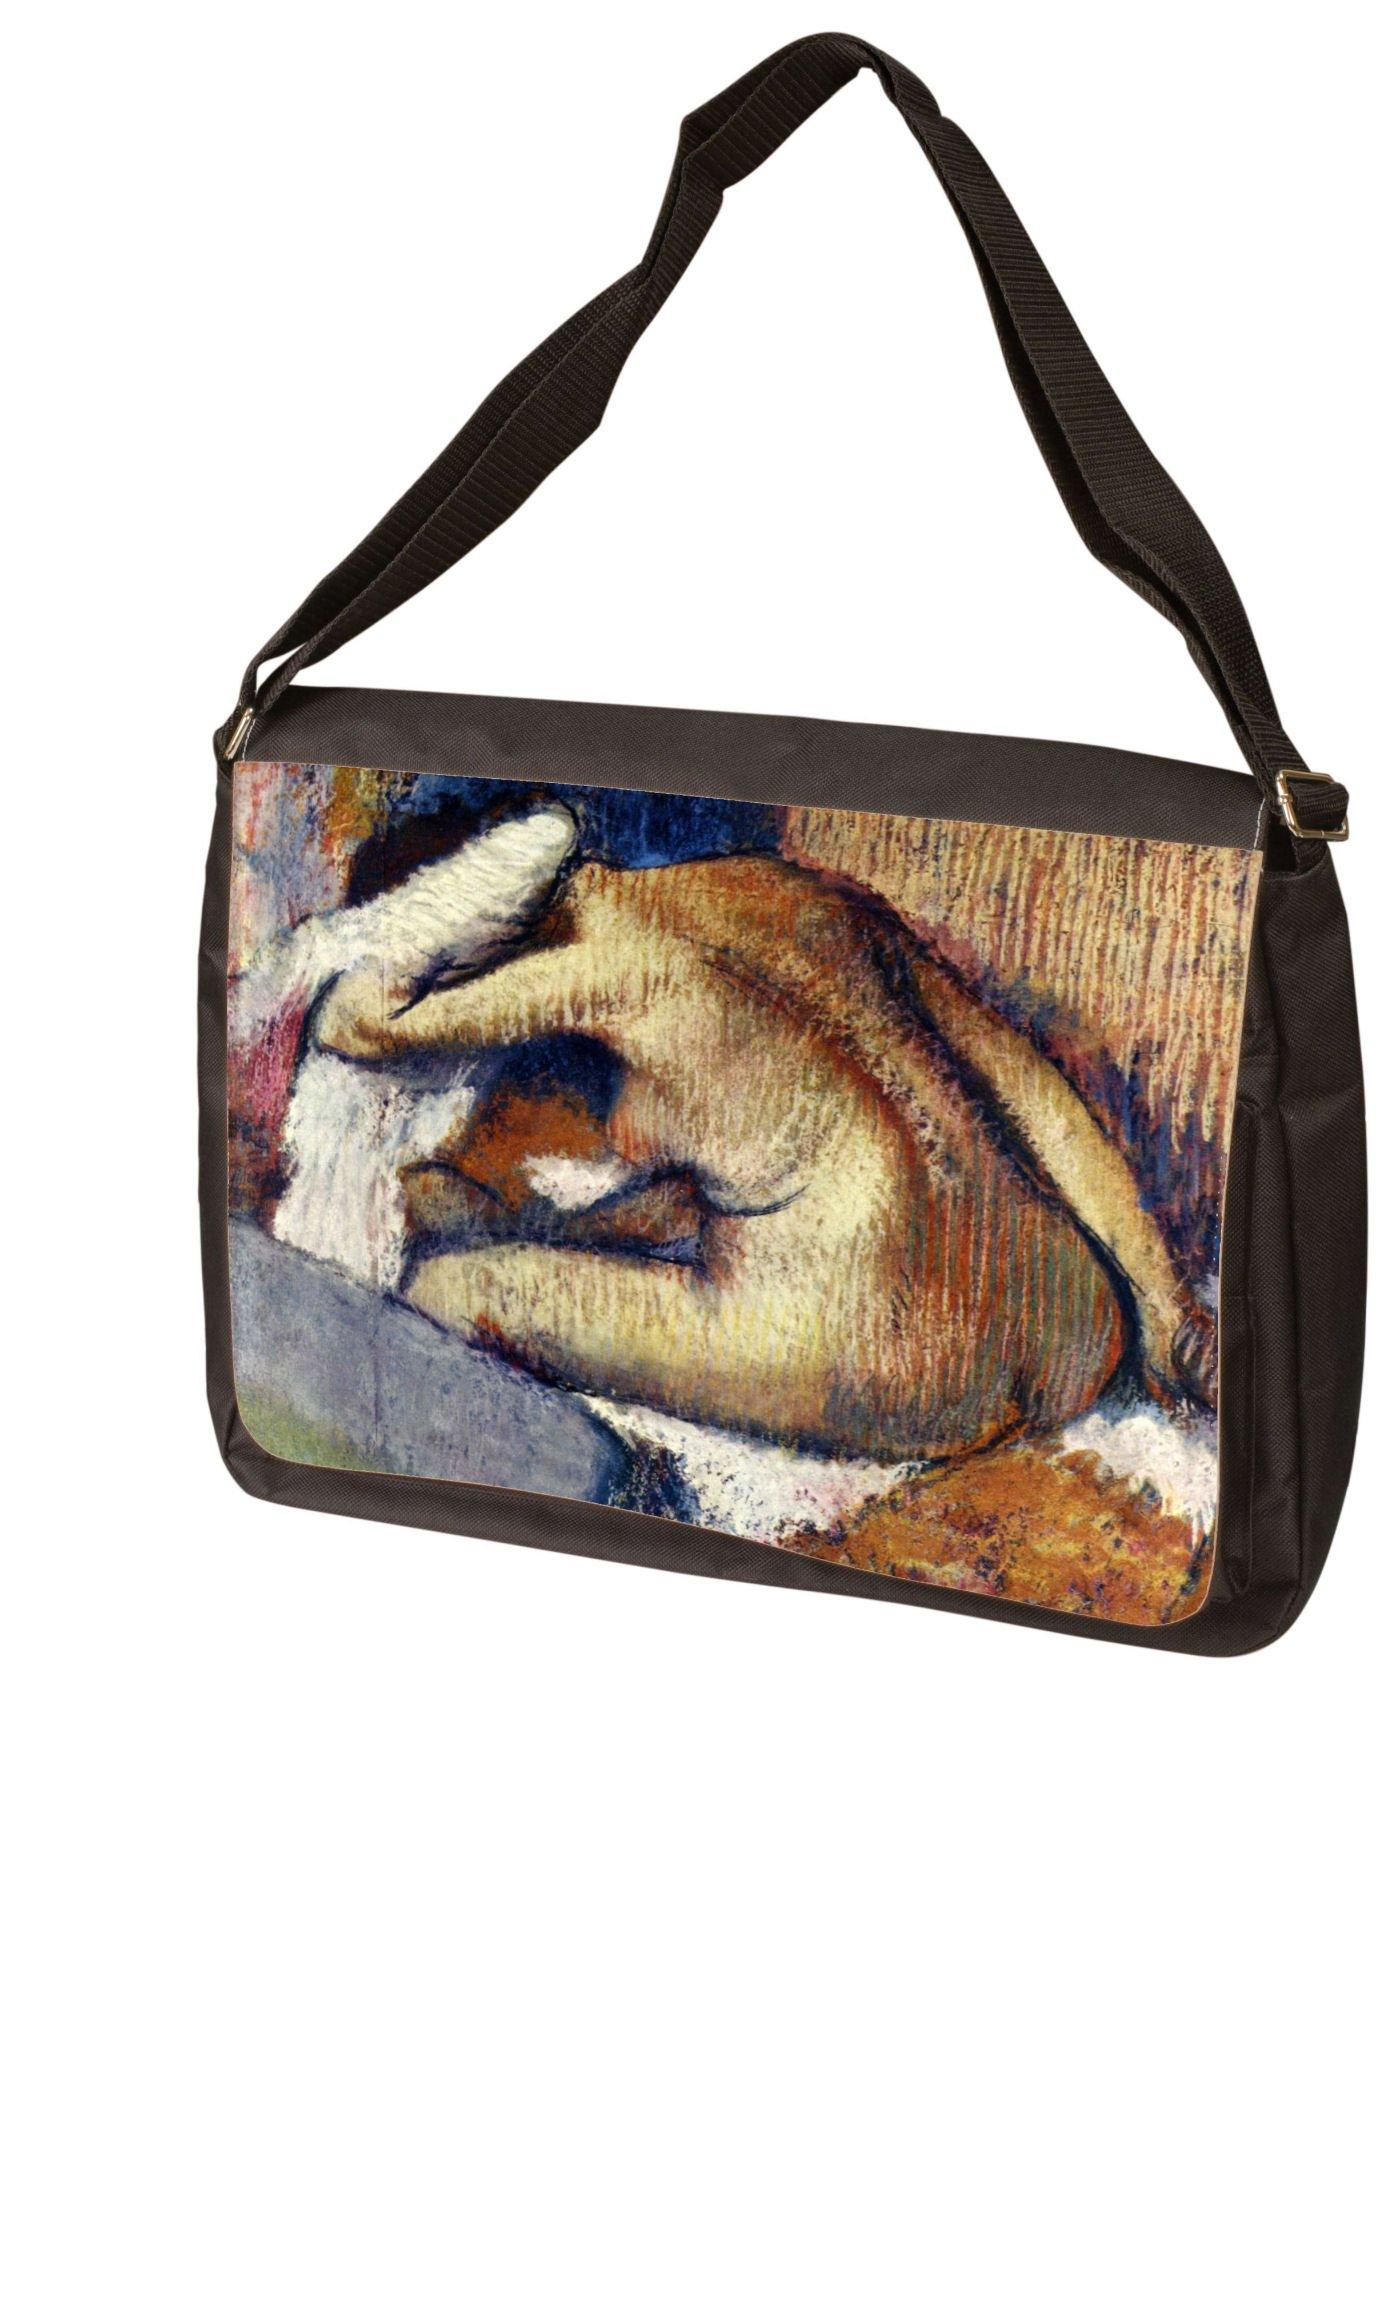 Woman drying hair By Edgar Degas Laptop Bag - Shoulder Bag - Messenger Bag